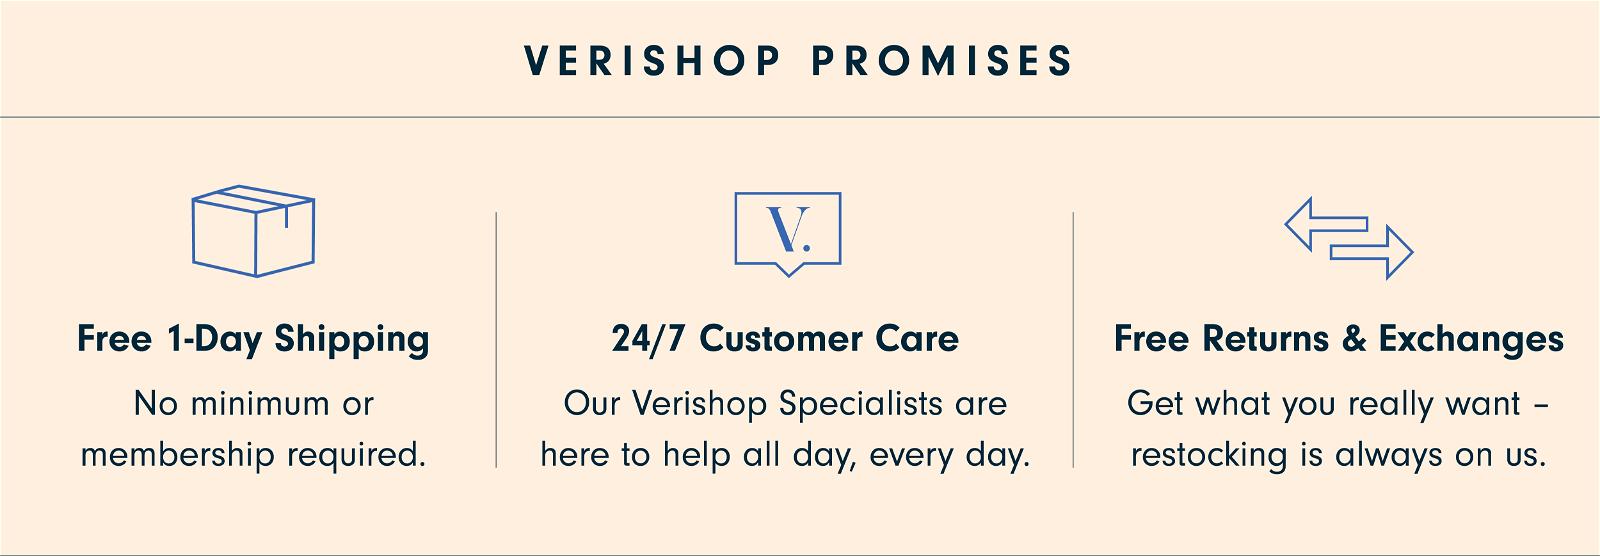 Verishop Promises